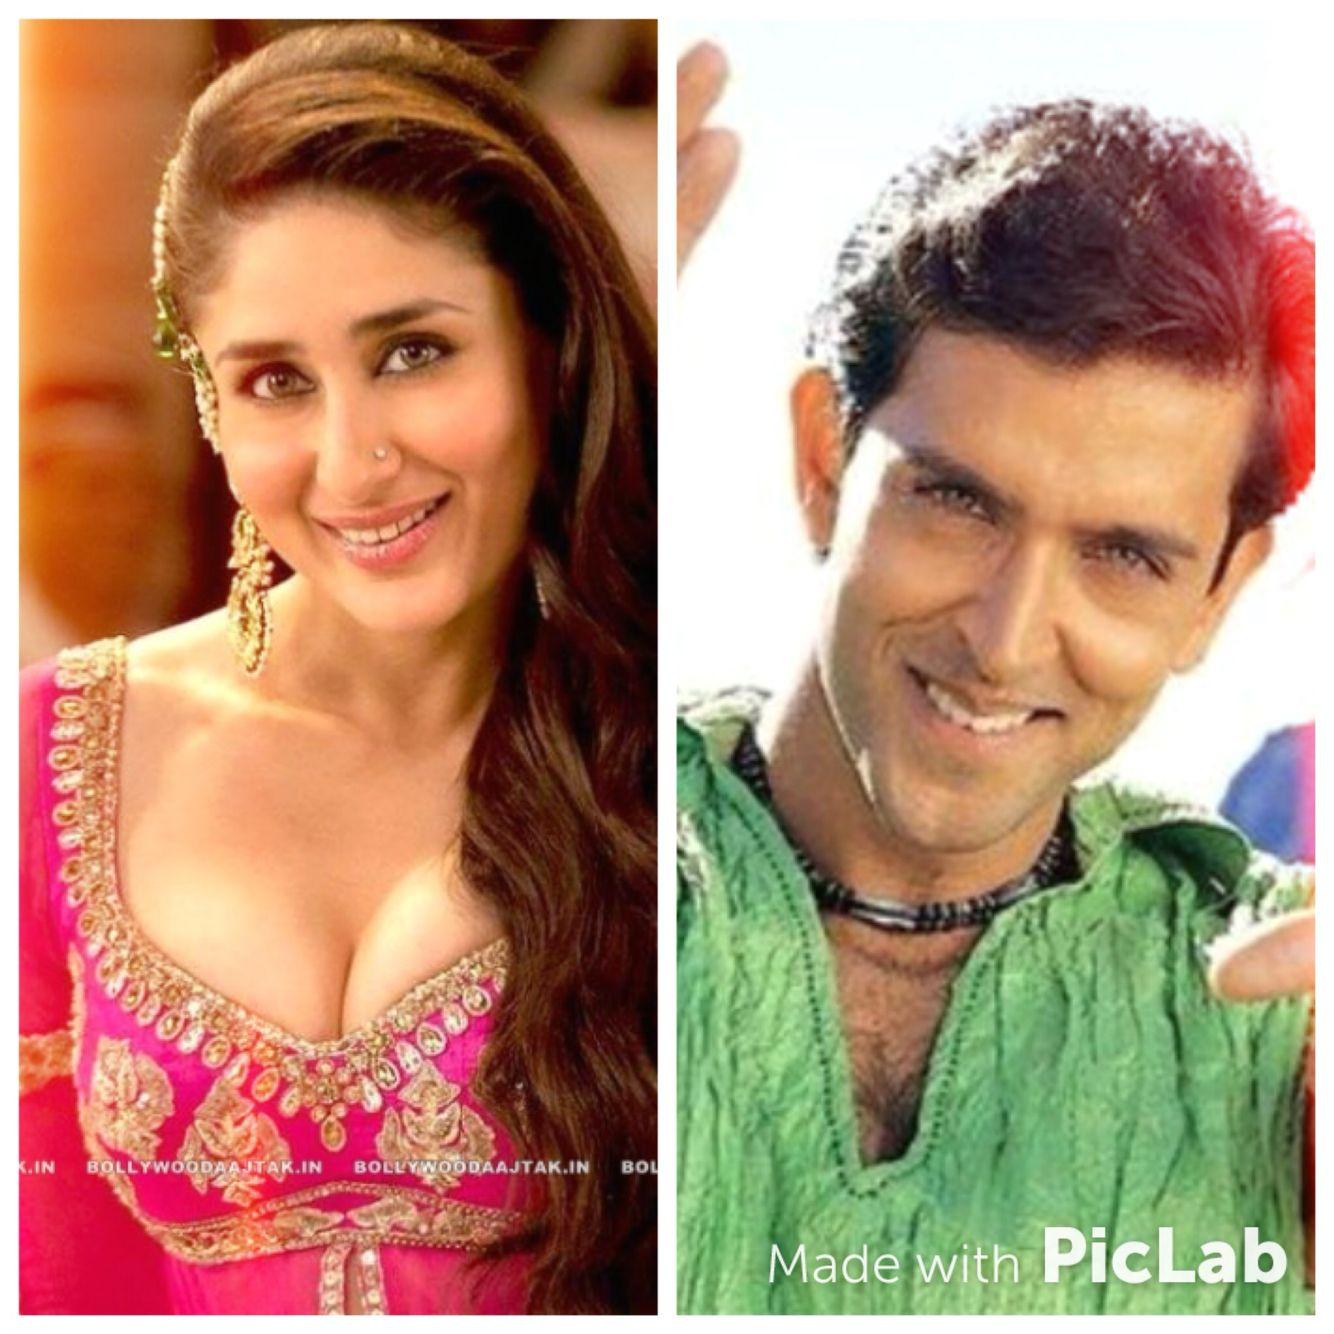 Aren T They Adorable Together Kareena Kapoor Hrithik Roshan Karthik Kashan Xd Hrithik Roshan Bollywood Kareena Kapoor